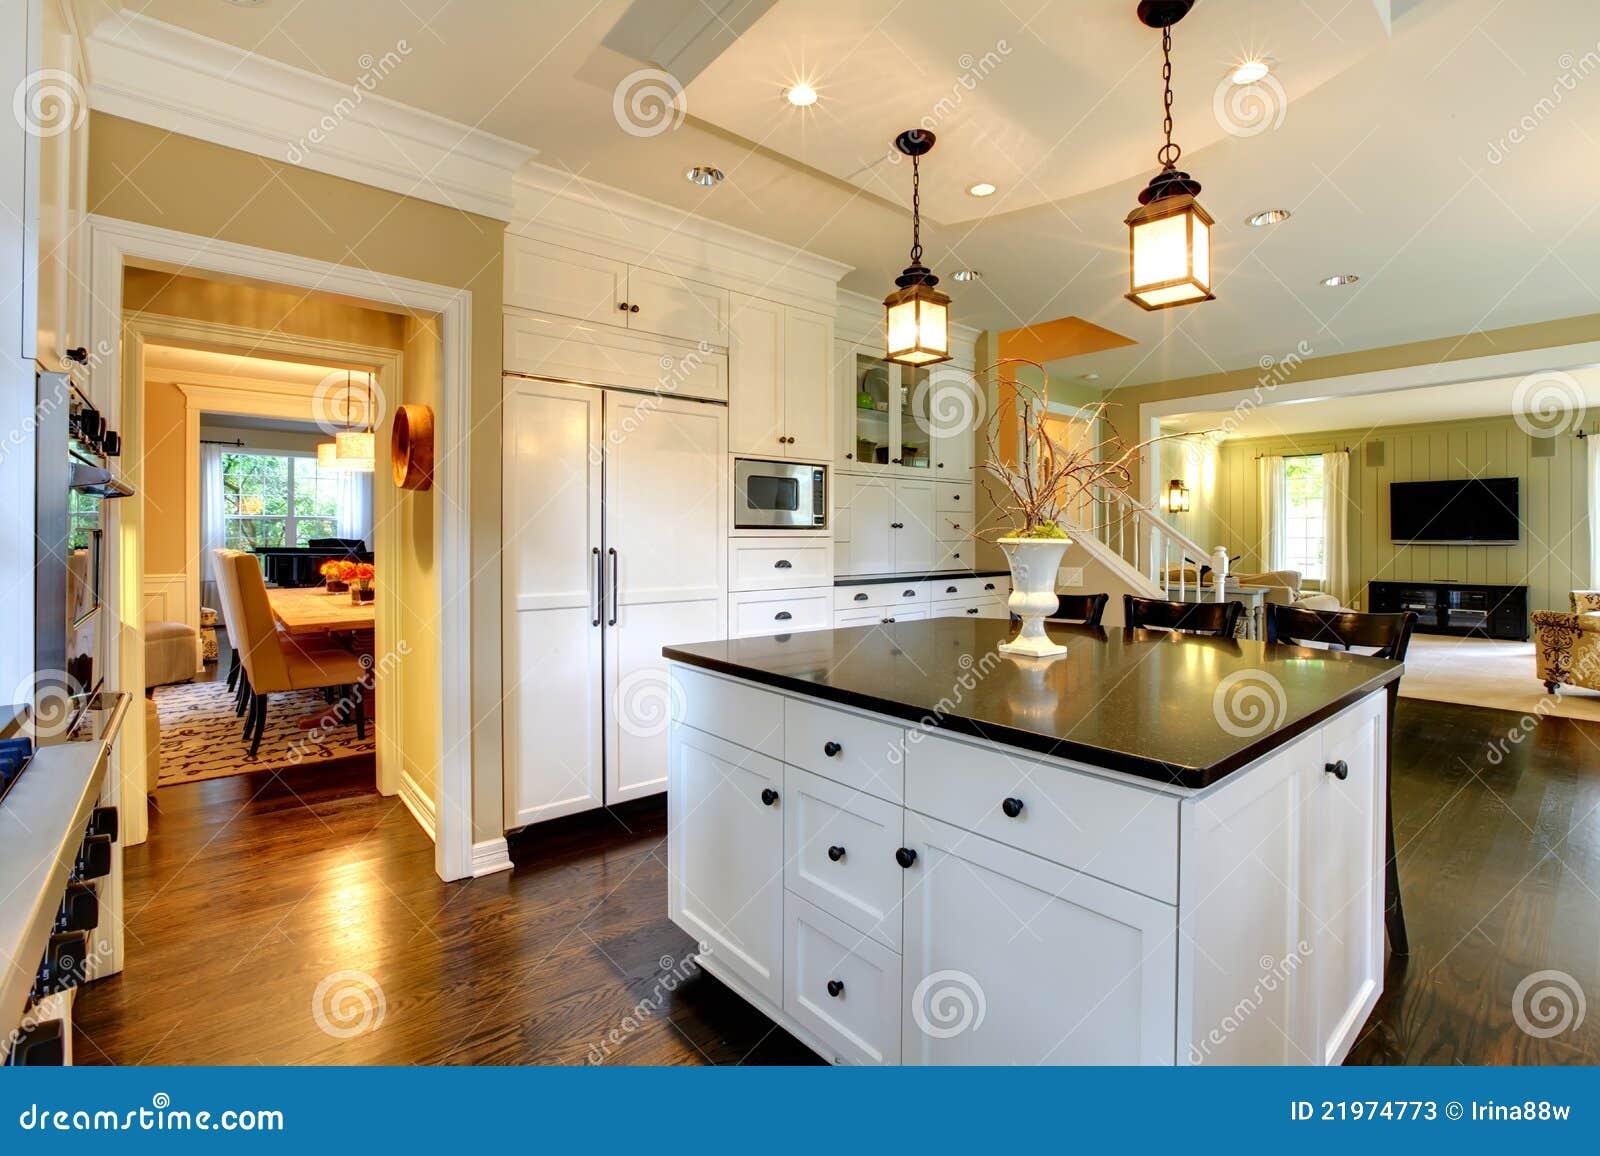 Luxury white large modern kitchen stock image image of for Large modern kitchen